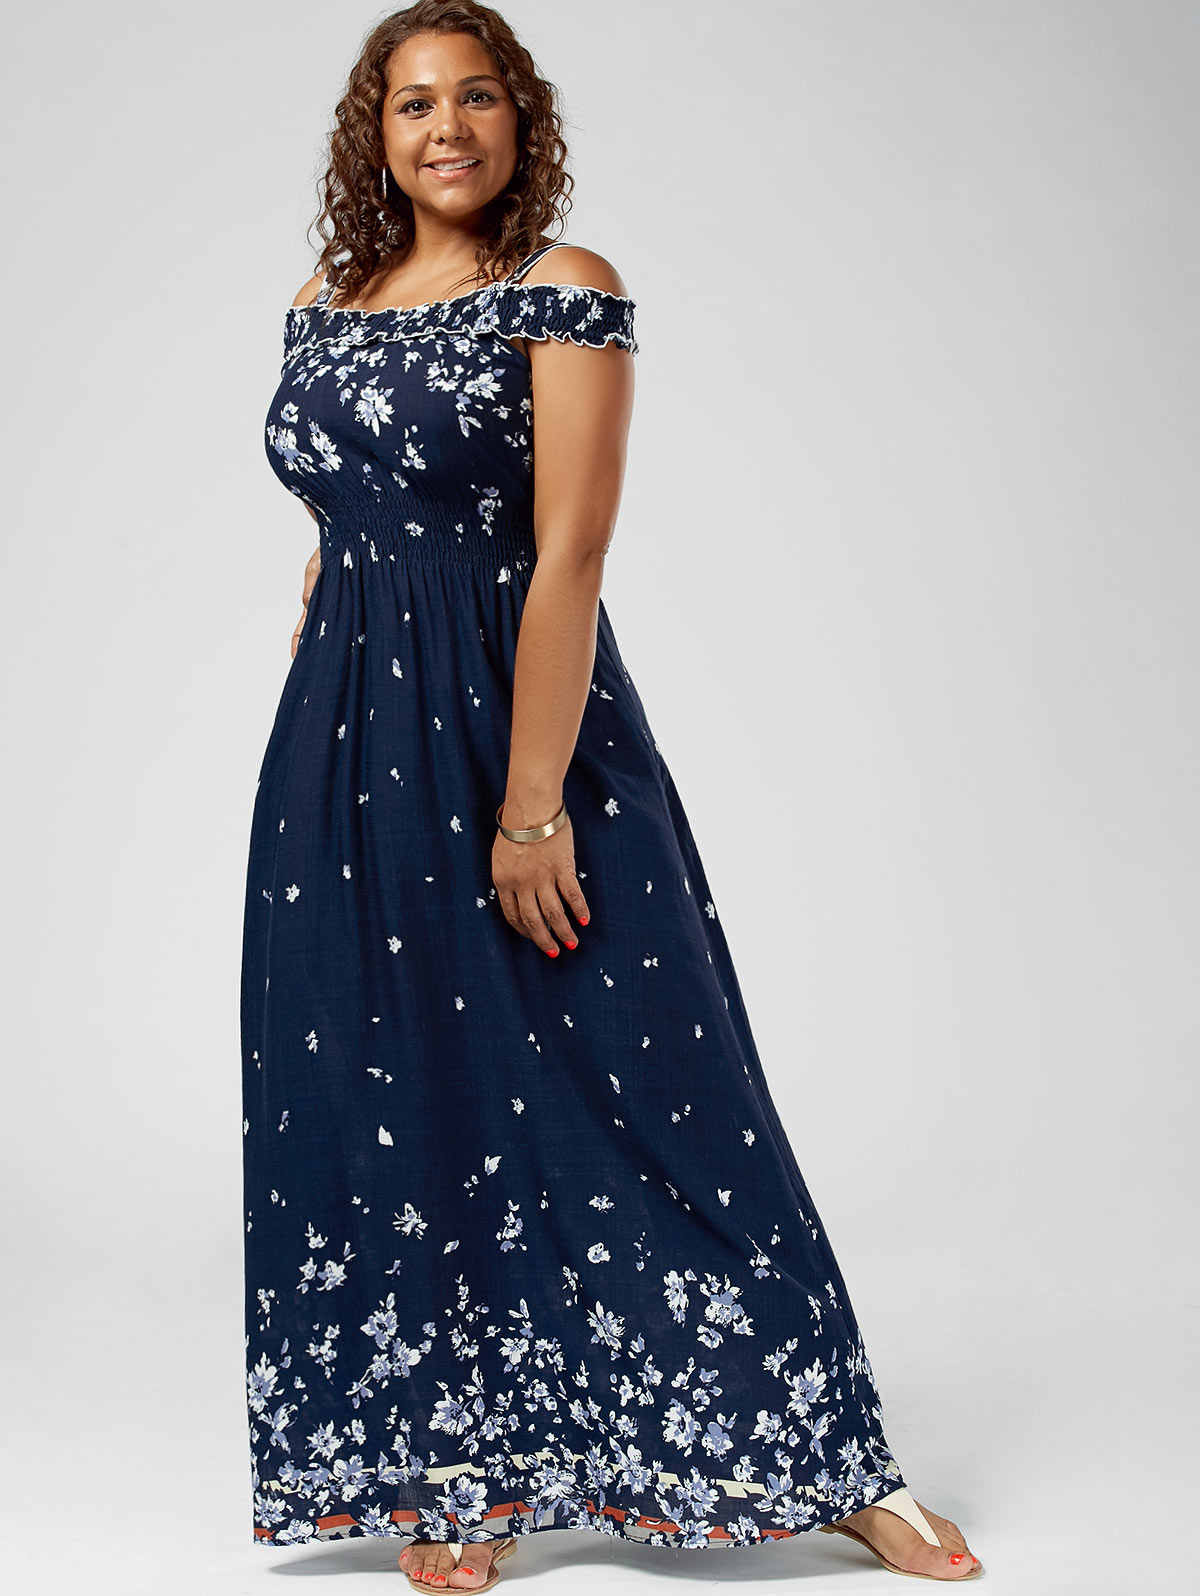 Kenancy Plus Size Floral Print Cold Shoulder Maxi Dress Women High Waist  Dresses Bohemian Robe Femme 3fb5e87b9ca2